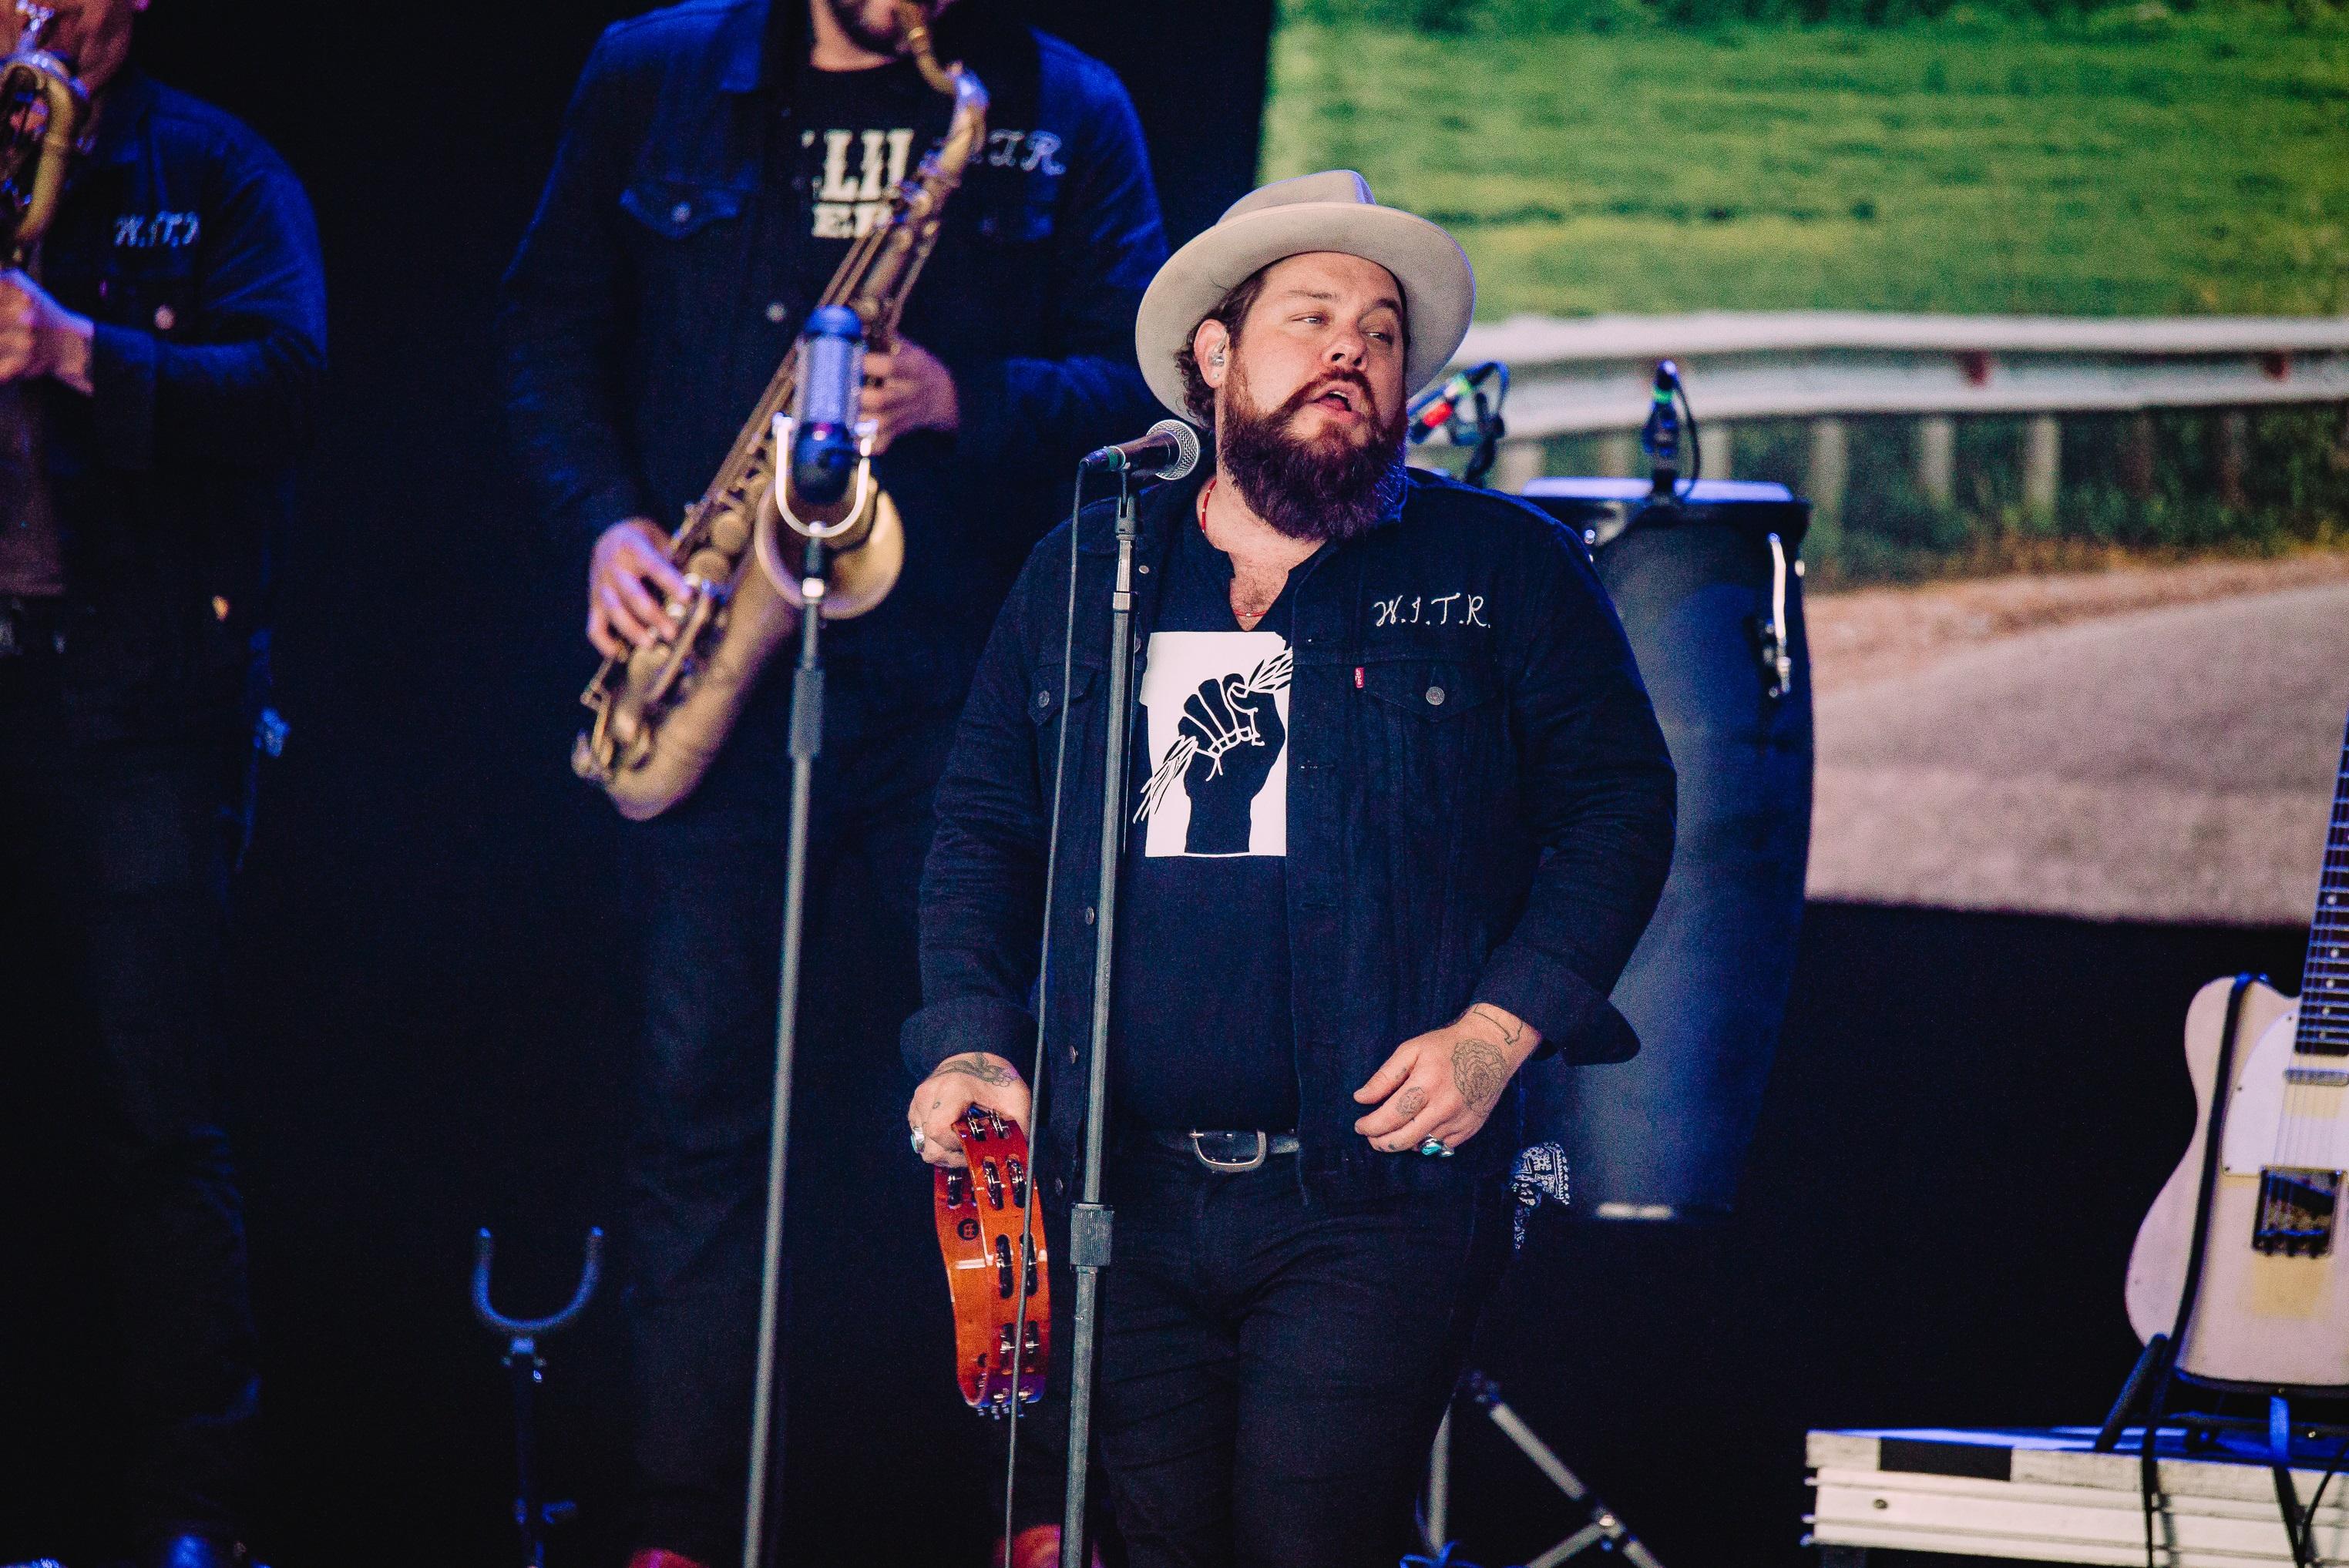 Nathaniel Ratcliff and The Night Sweats; Photo credit: Andrew Wendowski/Sounds Like Nashville